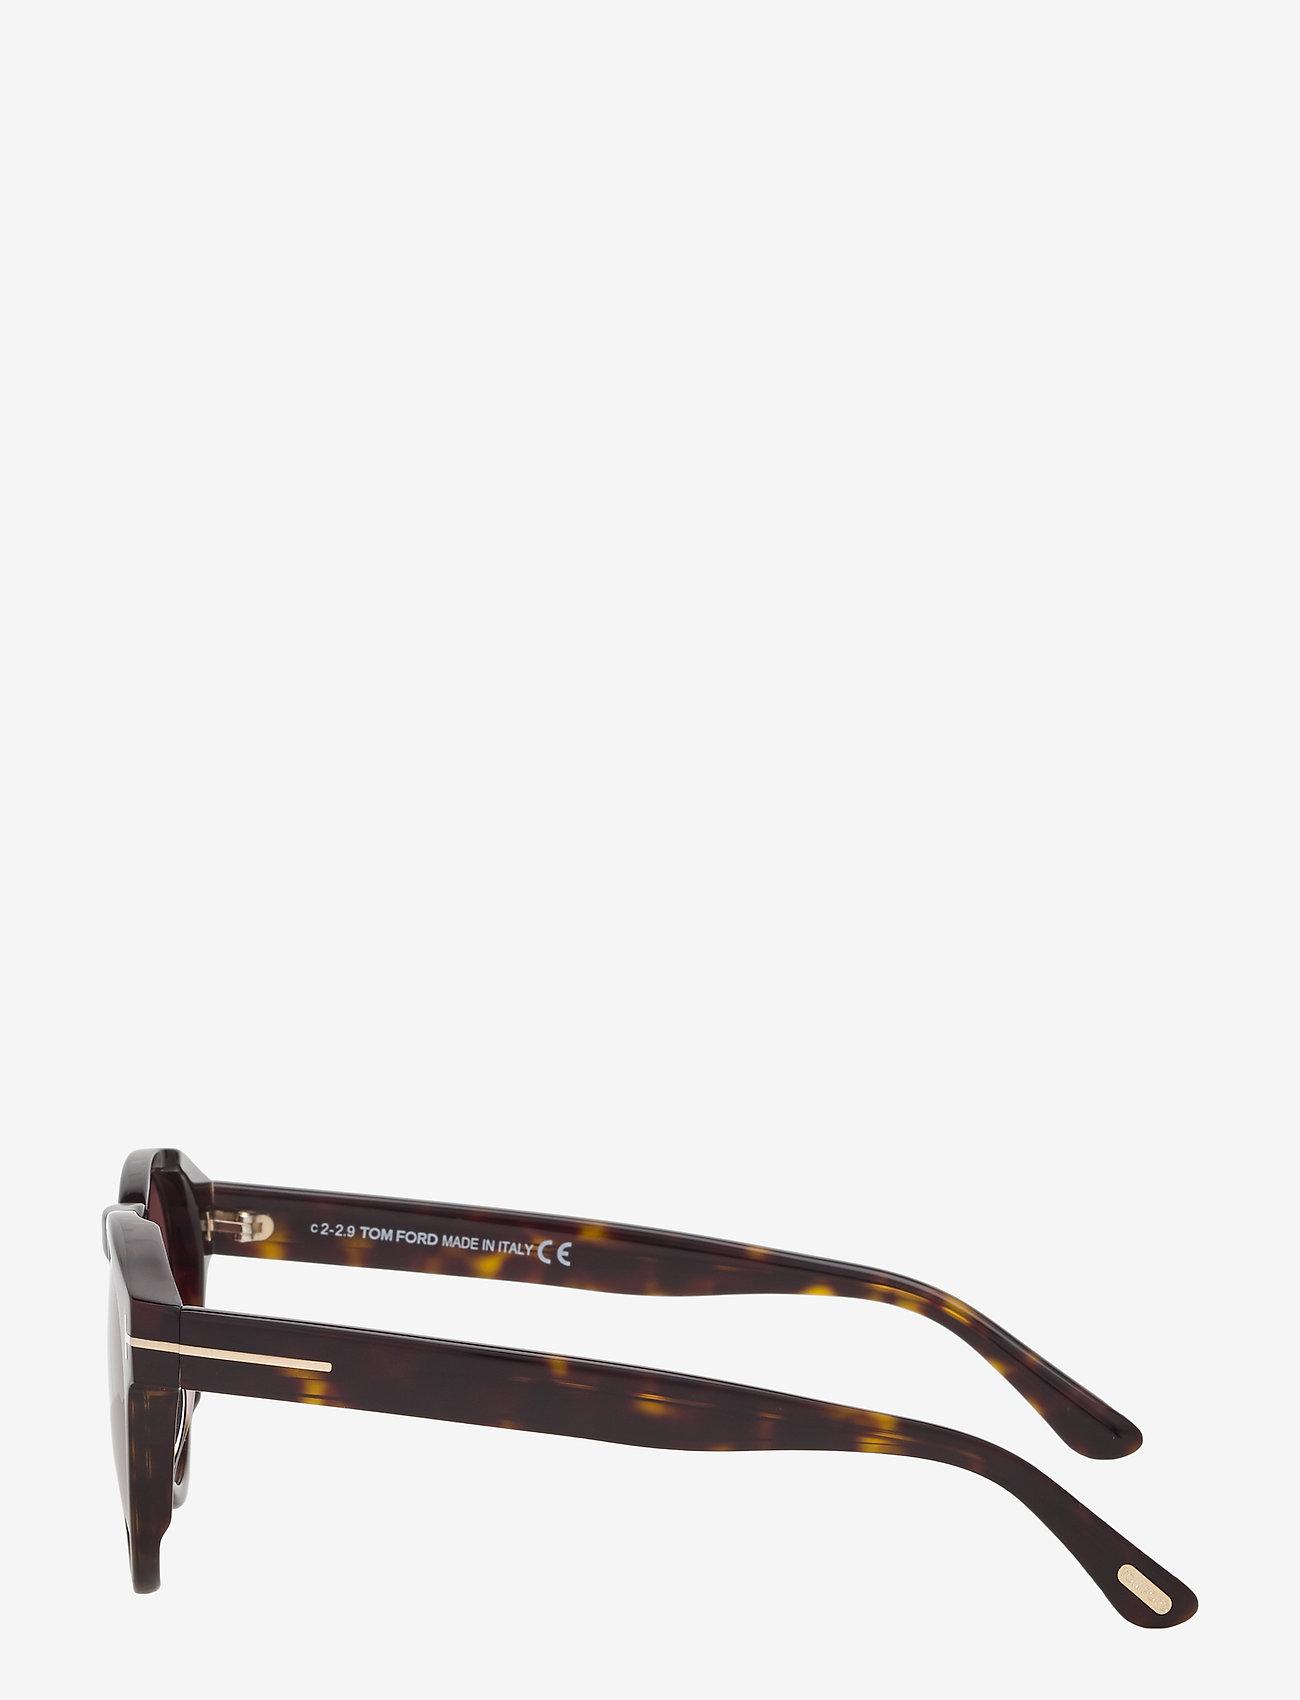 Tom Ford Margaux-02 (Dark Havana) (272 €) - Tom Ford Sunglasses uT5X8